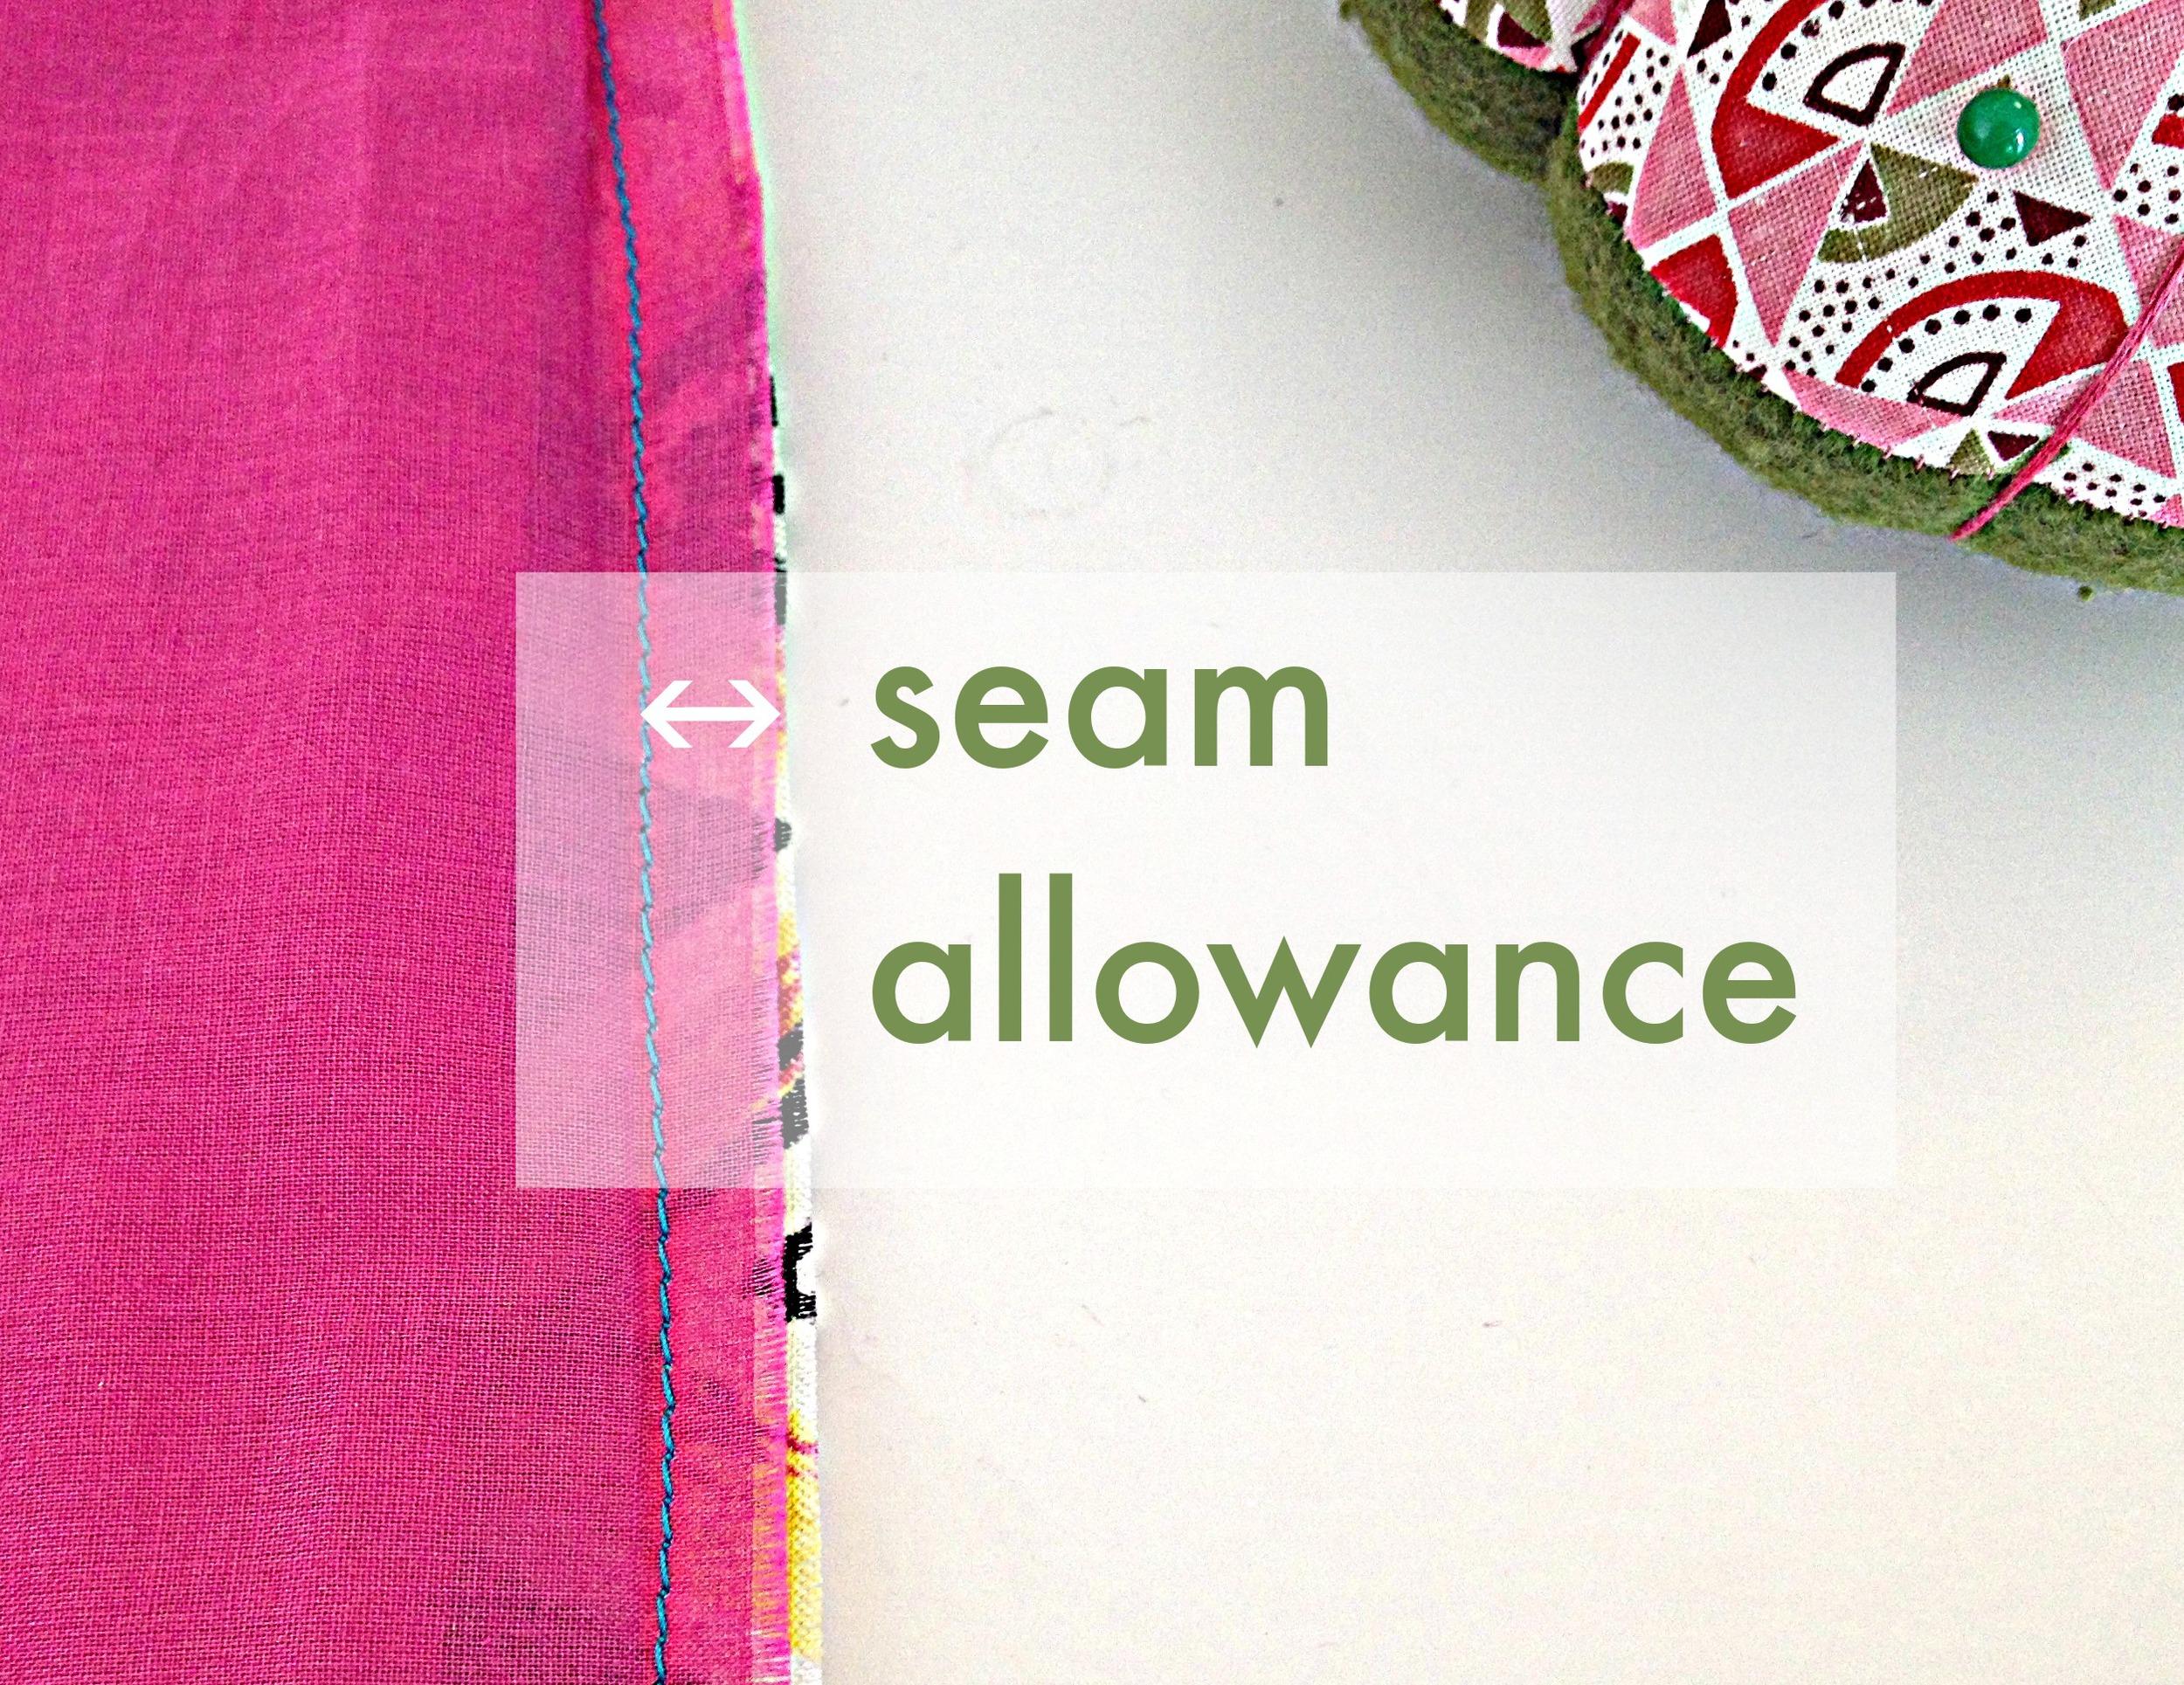 What is a Seam Allowance?